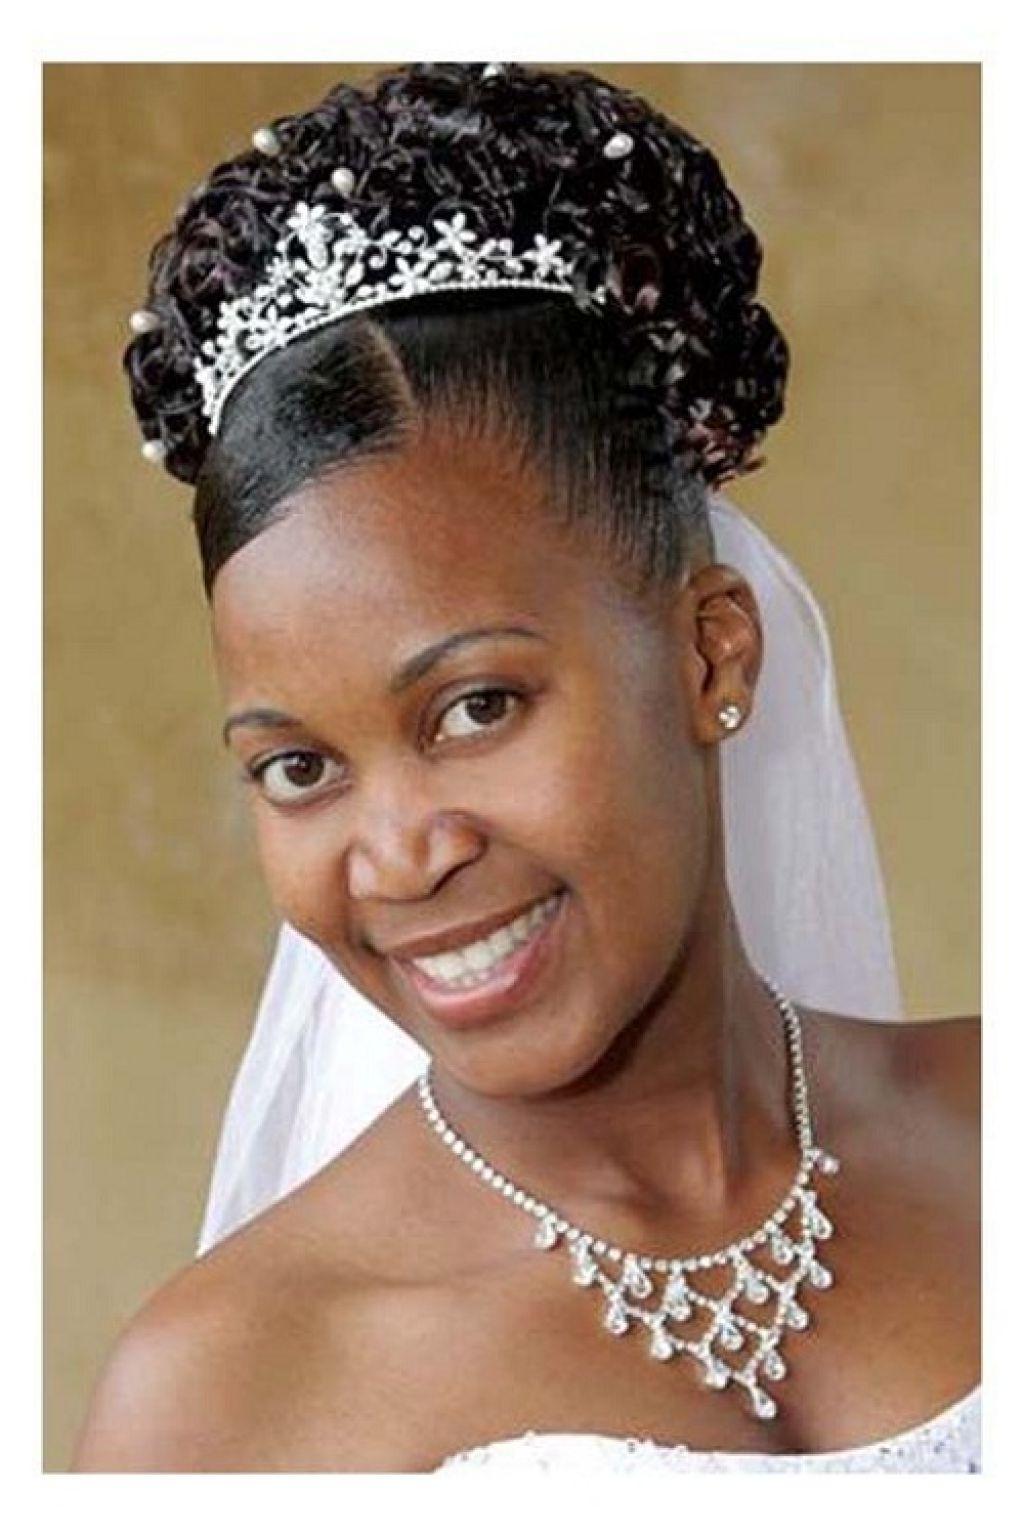 Trendy Wedding Hairstyles For Black Girl In African American Braids Hairstyles For Girls African American Braids (View 14 of 15)